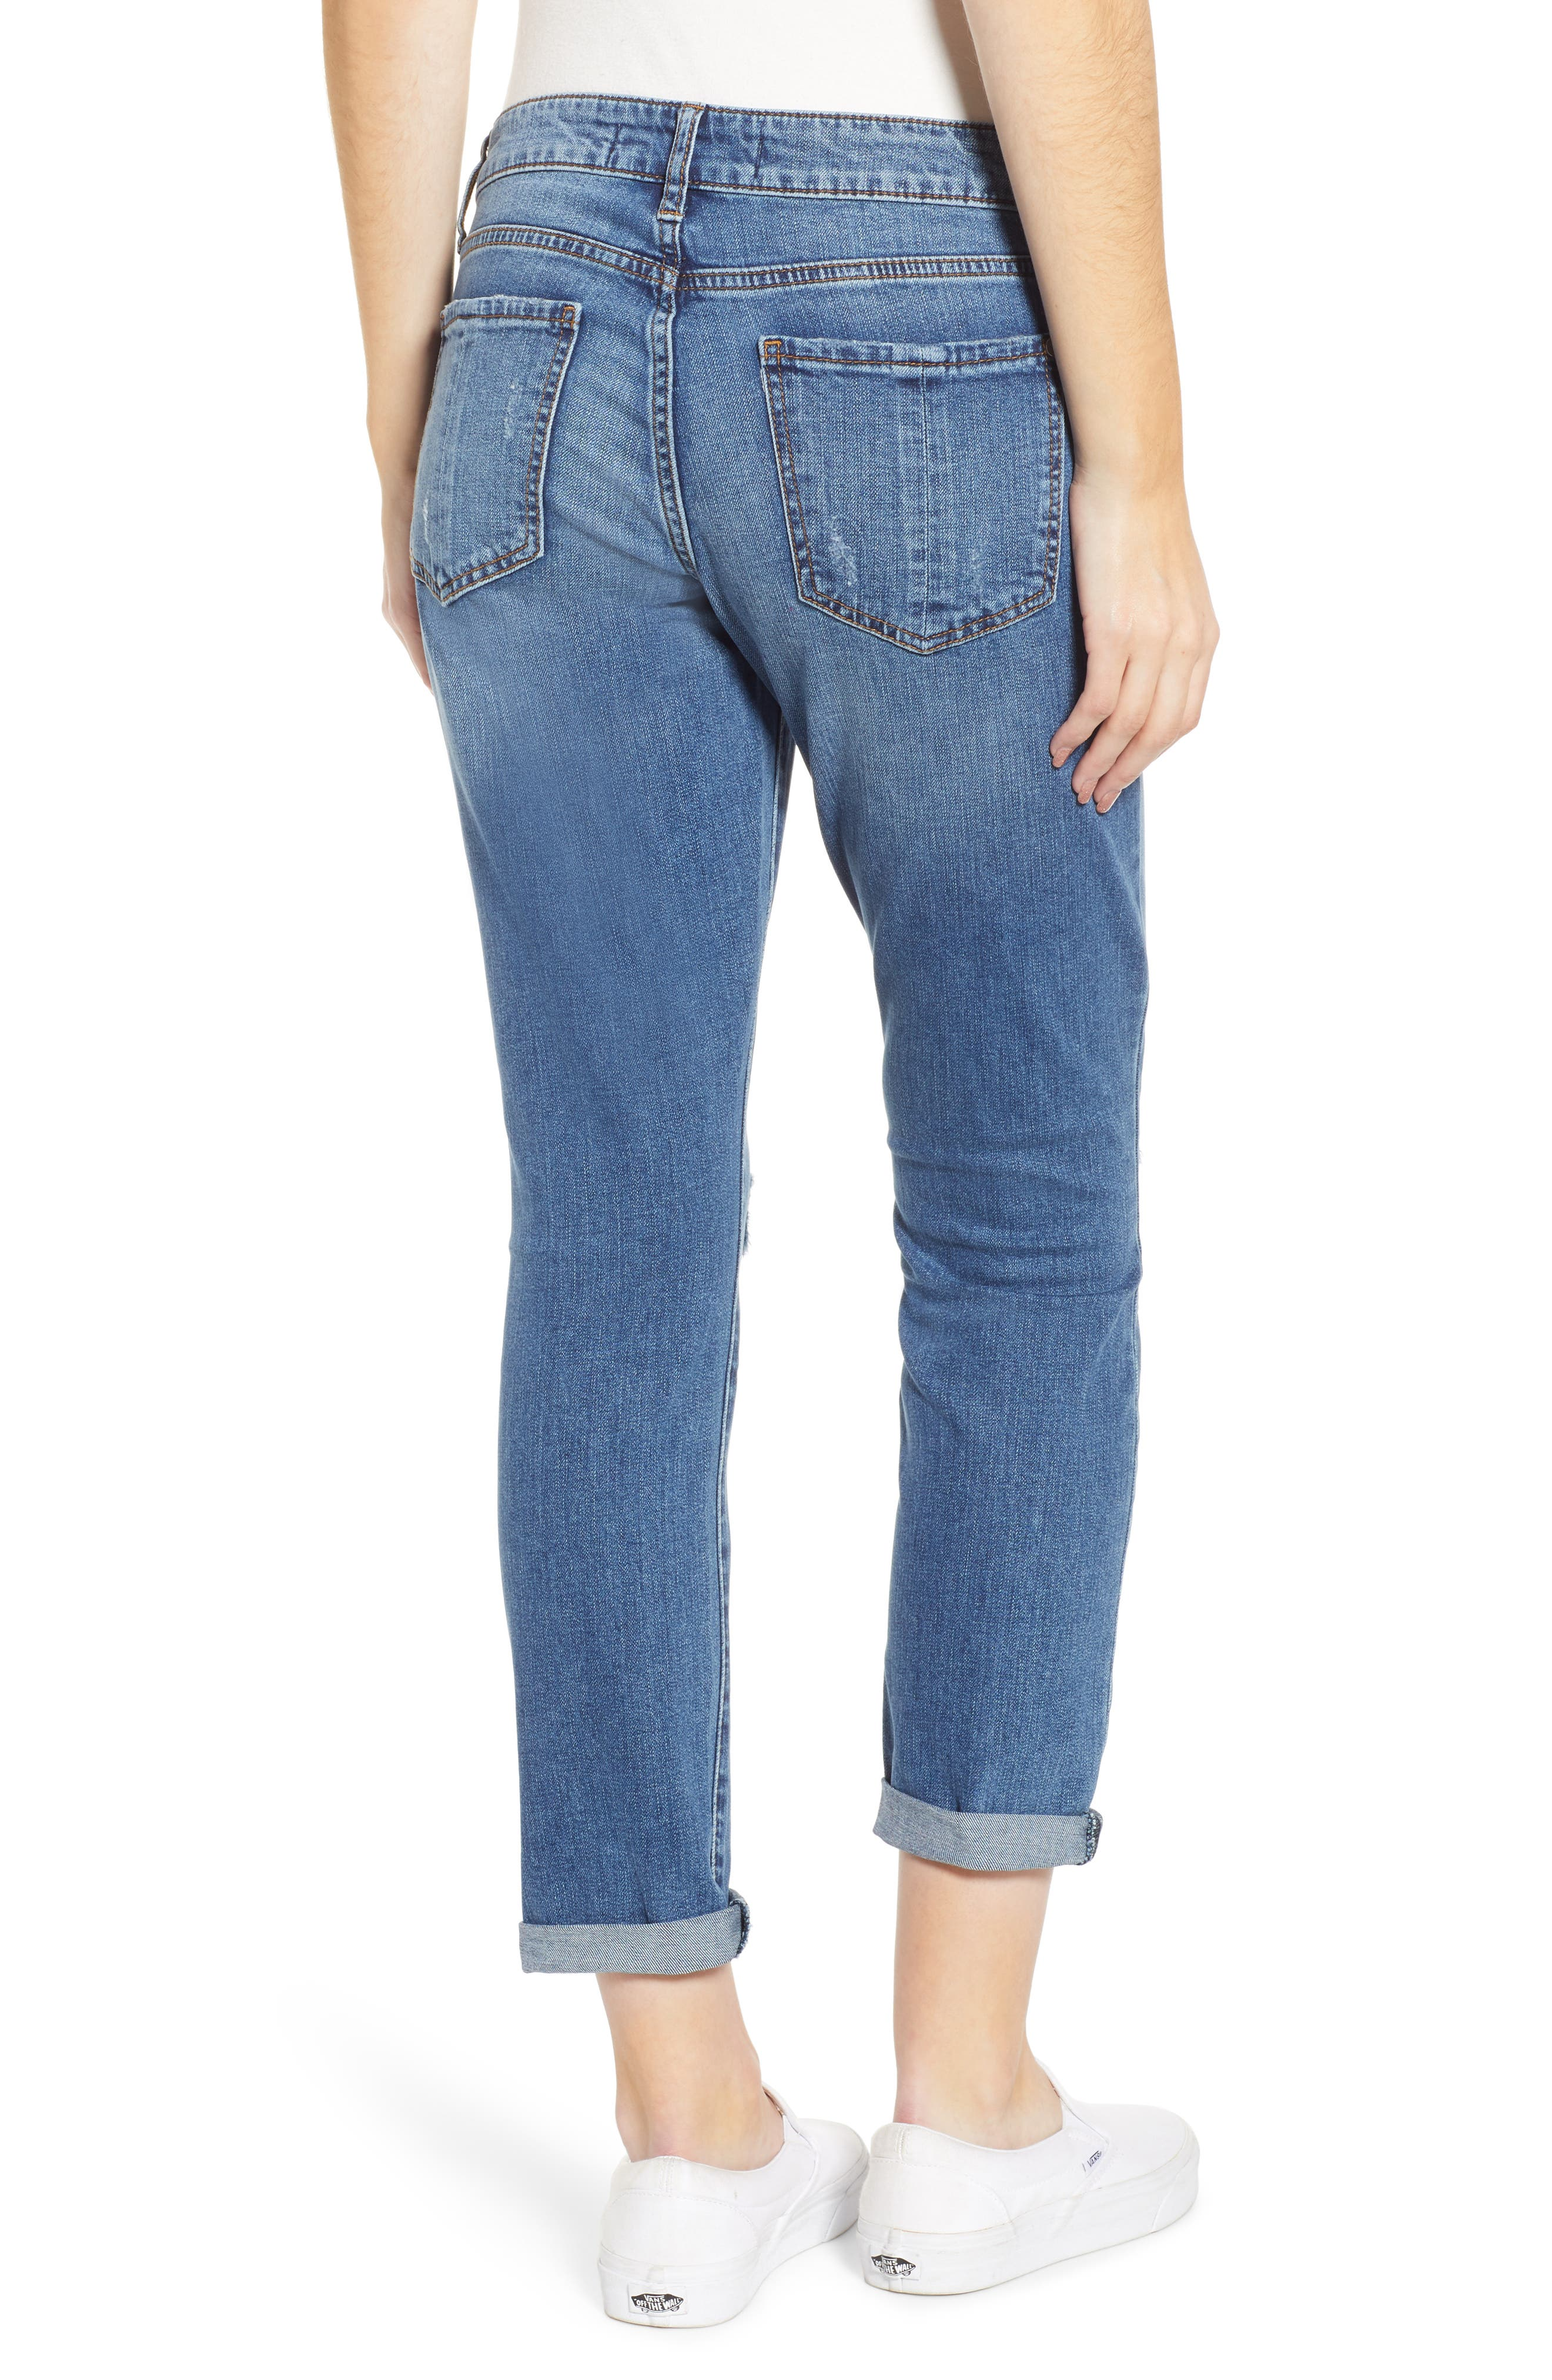 PROSPERITY DENIM, Distressed Ankle Boyfriend Jeans, Alternate thumbnail 2, color, MEDIUM WASH